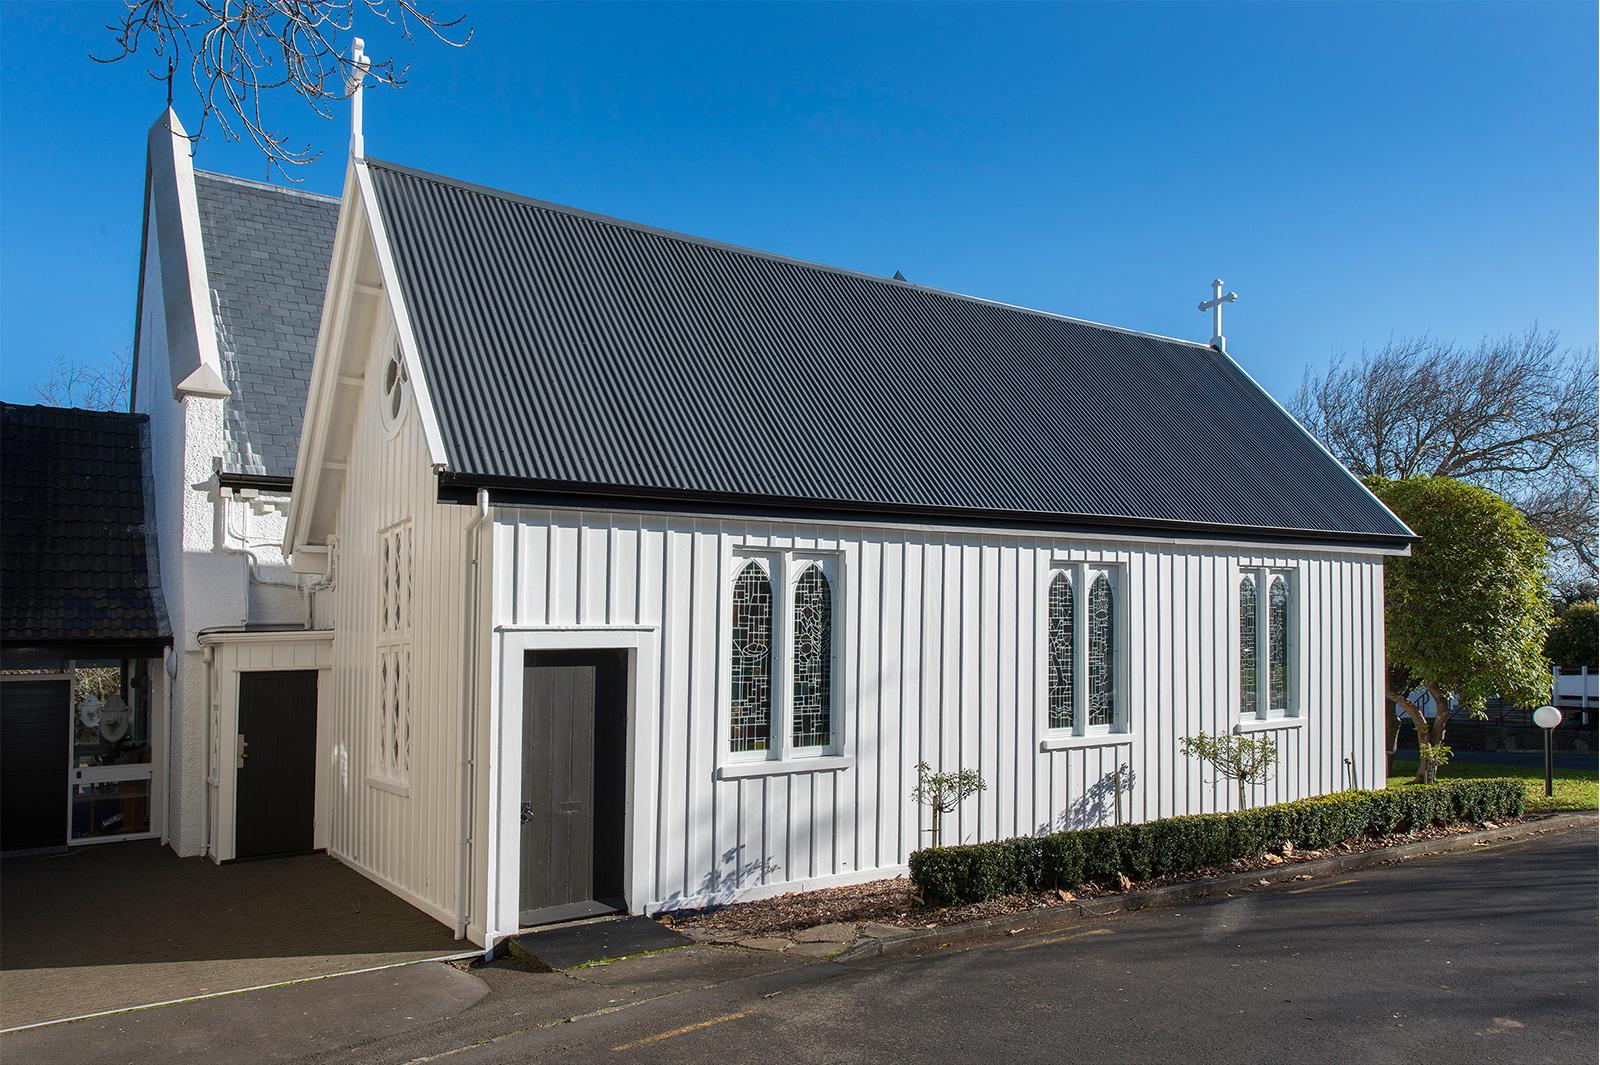 Construction-Company-Aspec-Diocesan-School-Chapel-Seismic-Upgrade-6